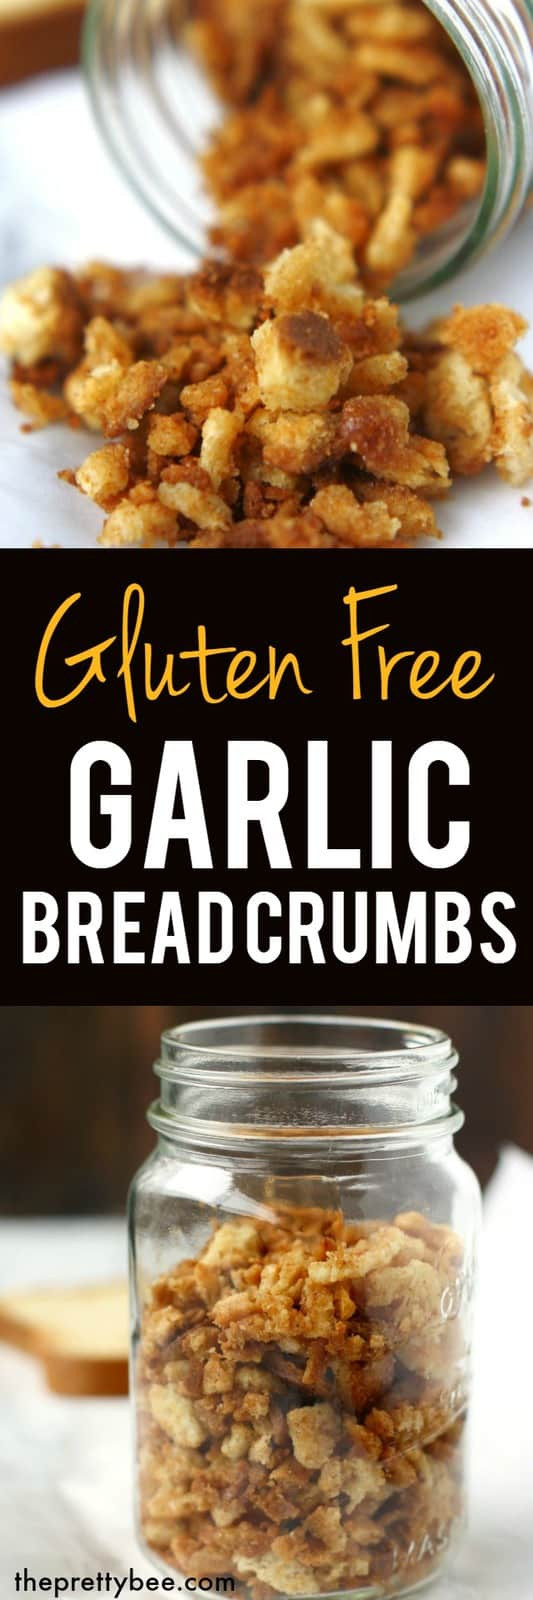 Gluten Free Bread Crumbs  How to Make Gluten Free Bread Crumbs The Pretty Bee